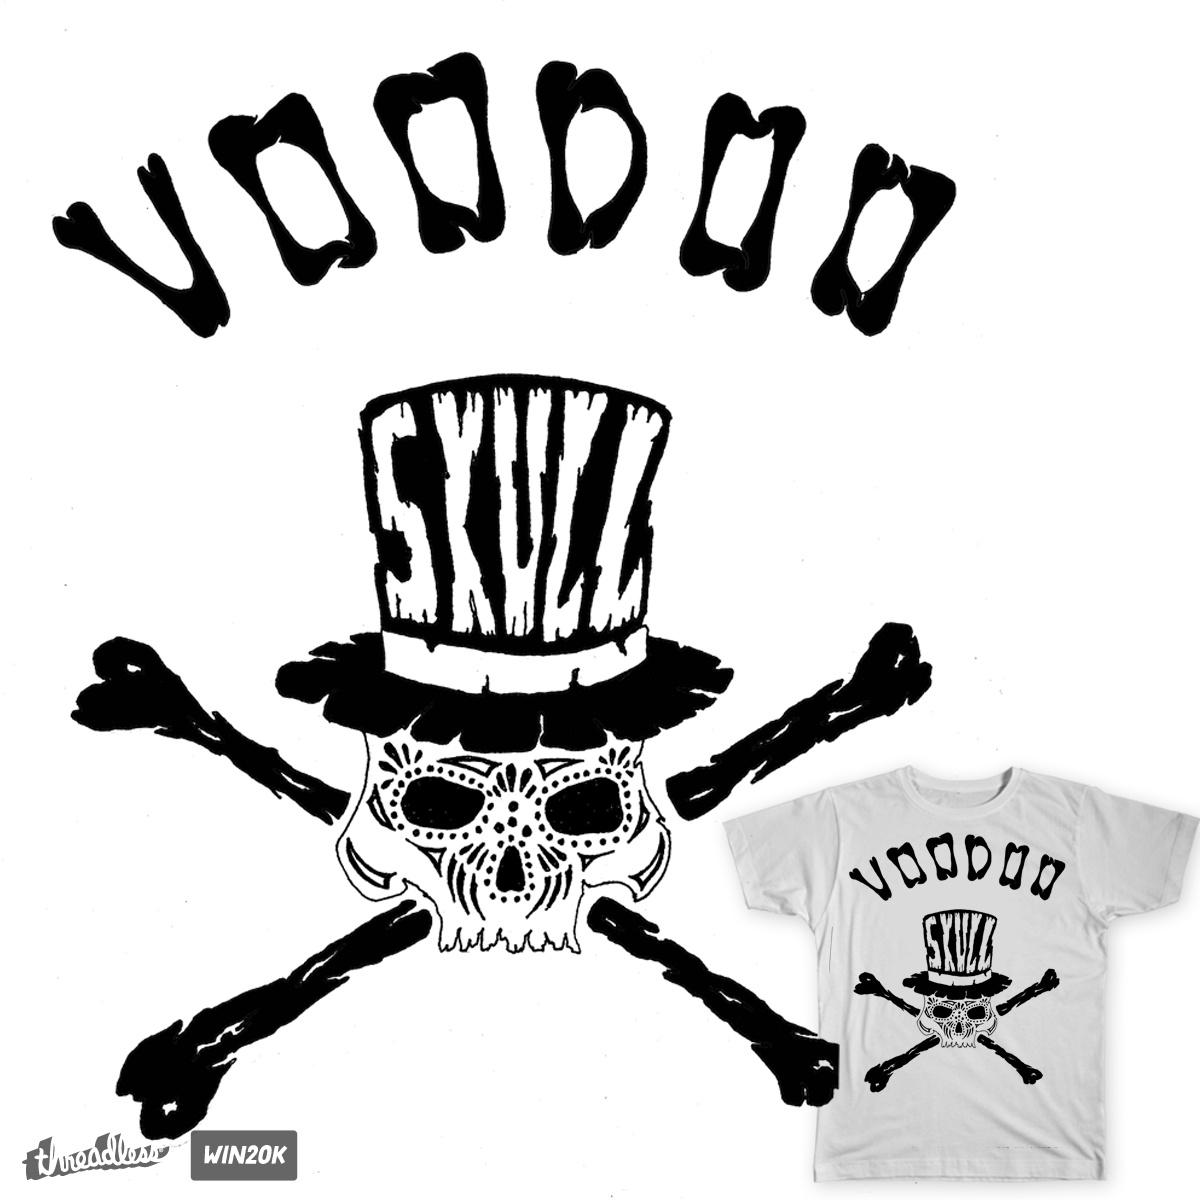 Voodoo by TRYBYK on Threadless